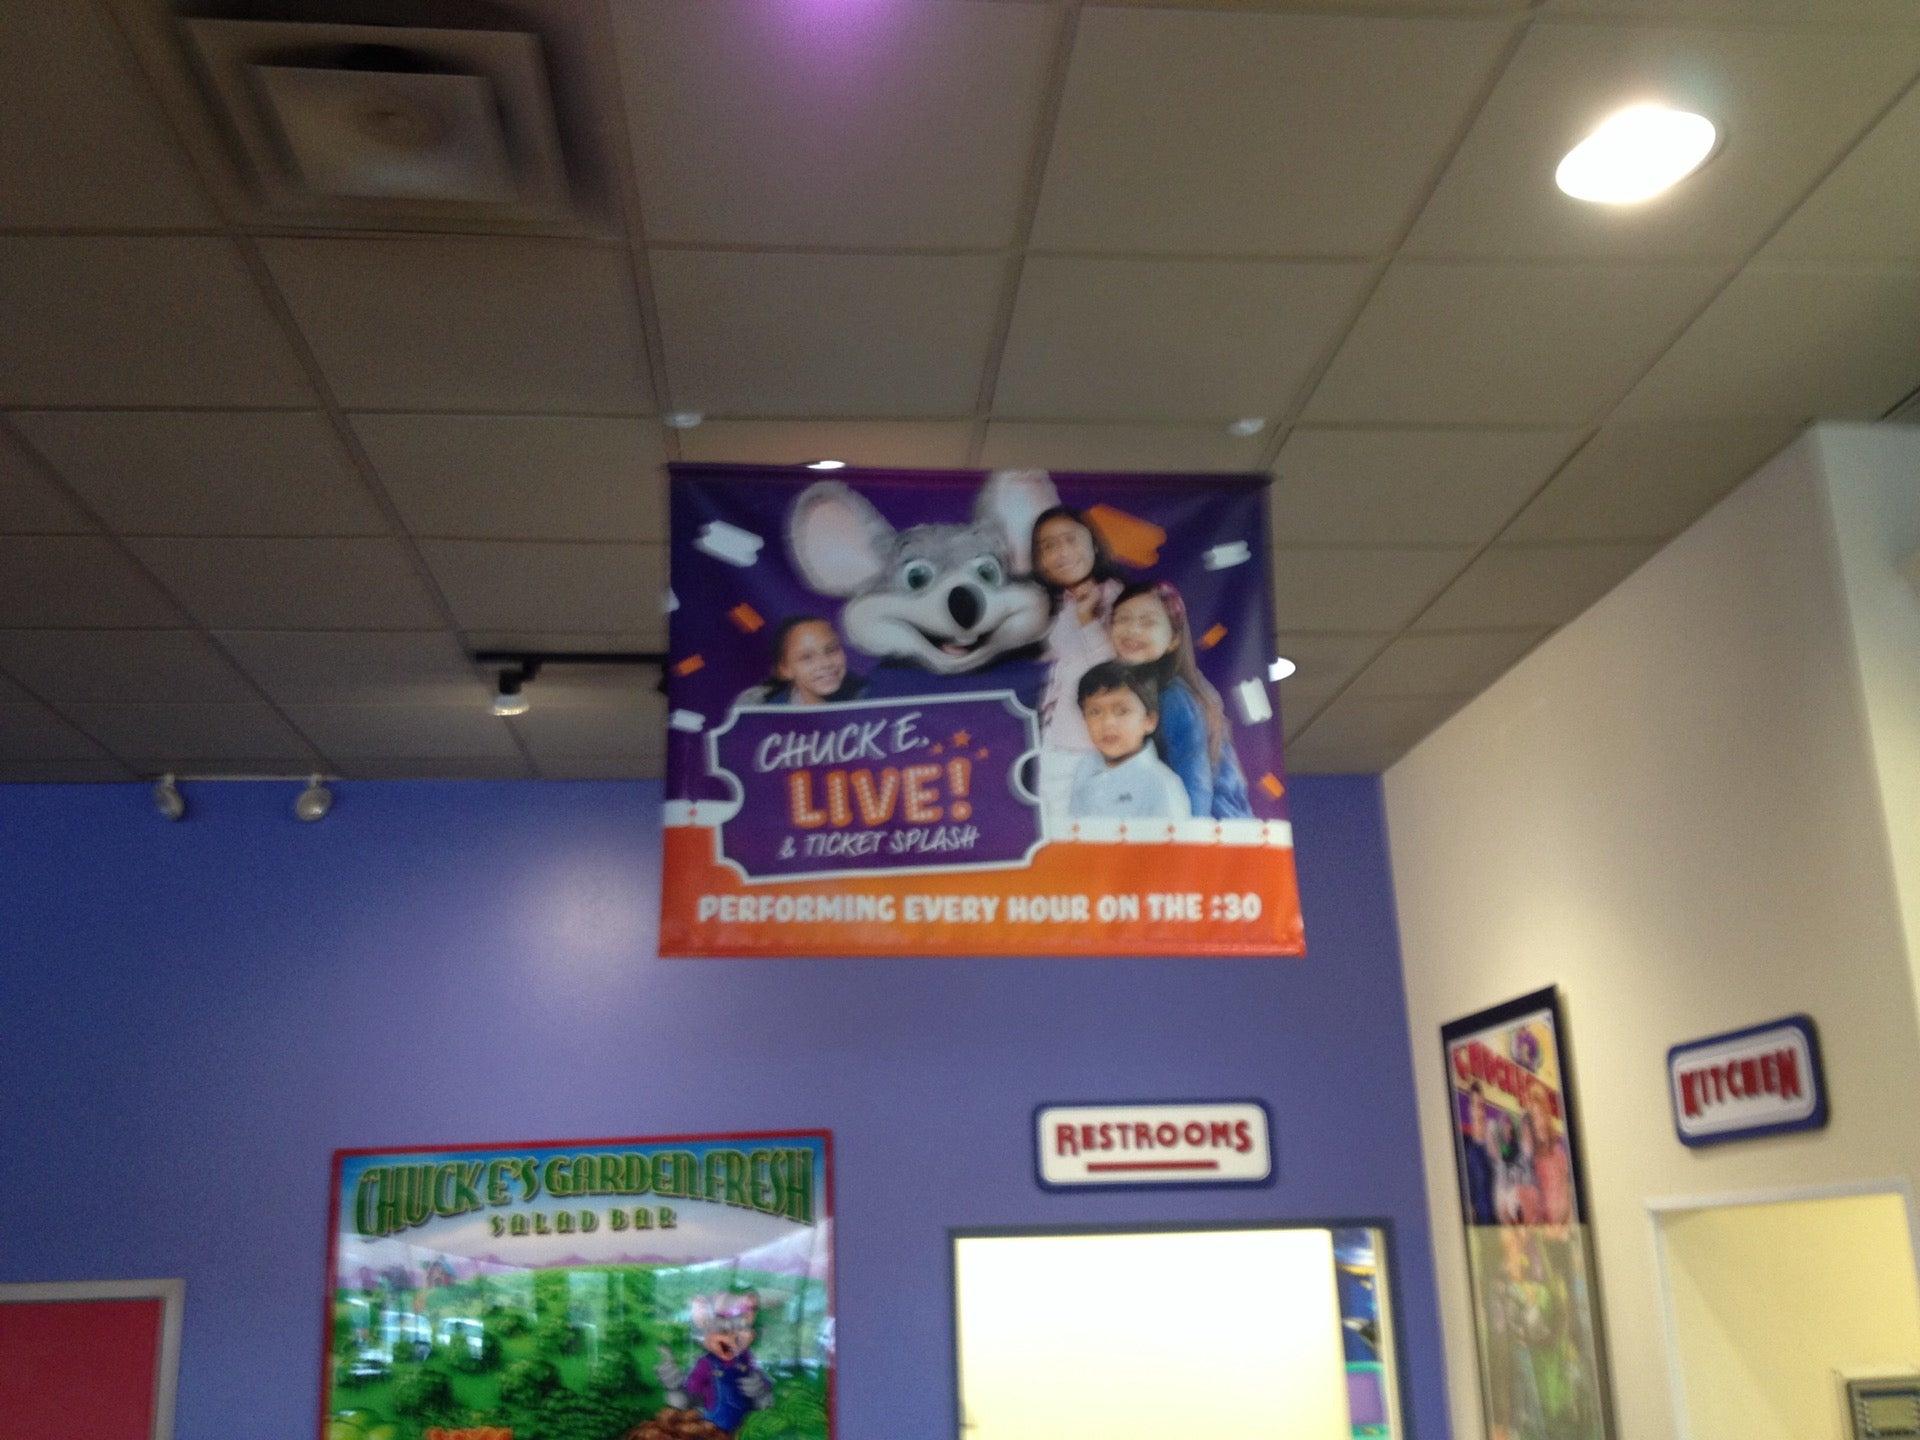 Chuck E. Cheese's,chuckie cheese,chucky cheese,entertainment center,family entertainment,family fun,kids entertainment,pizza